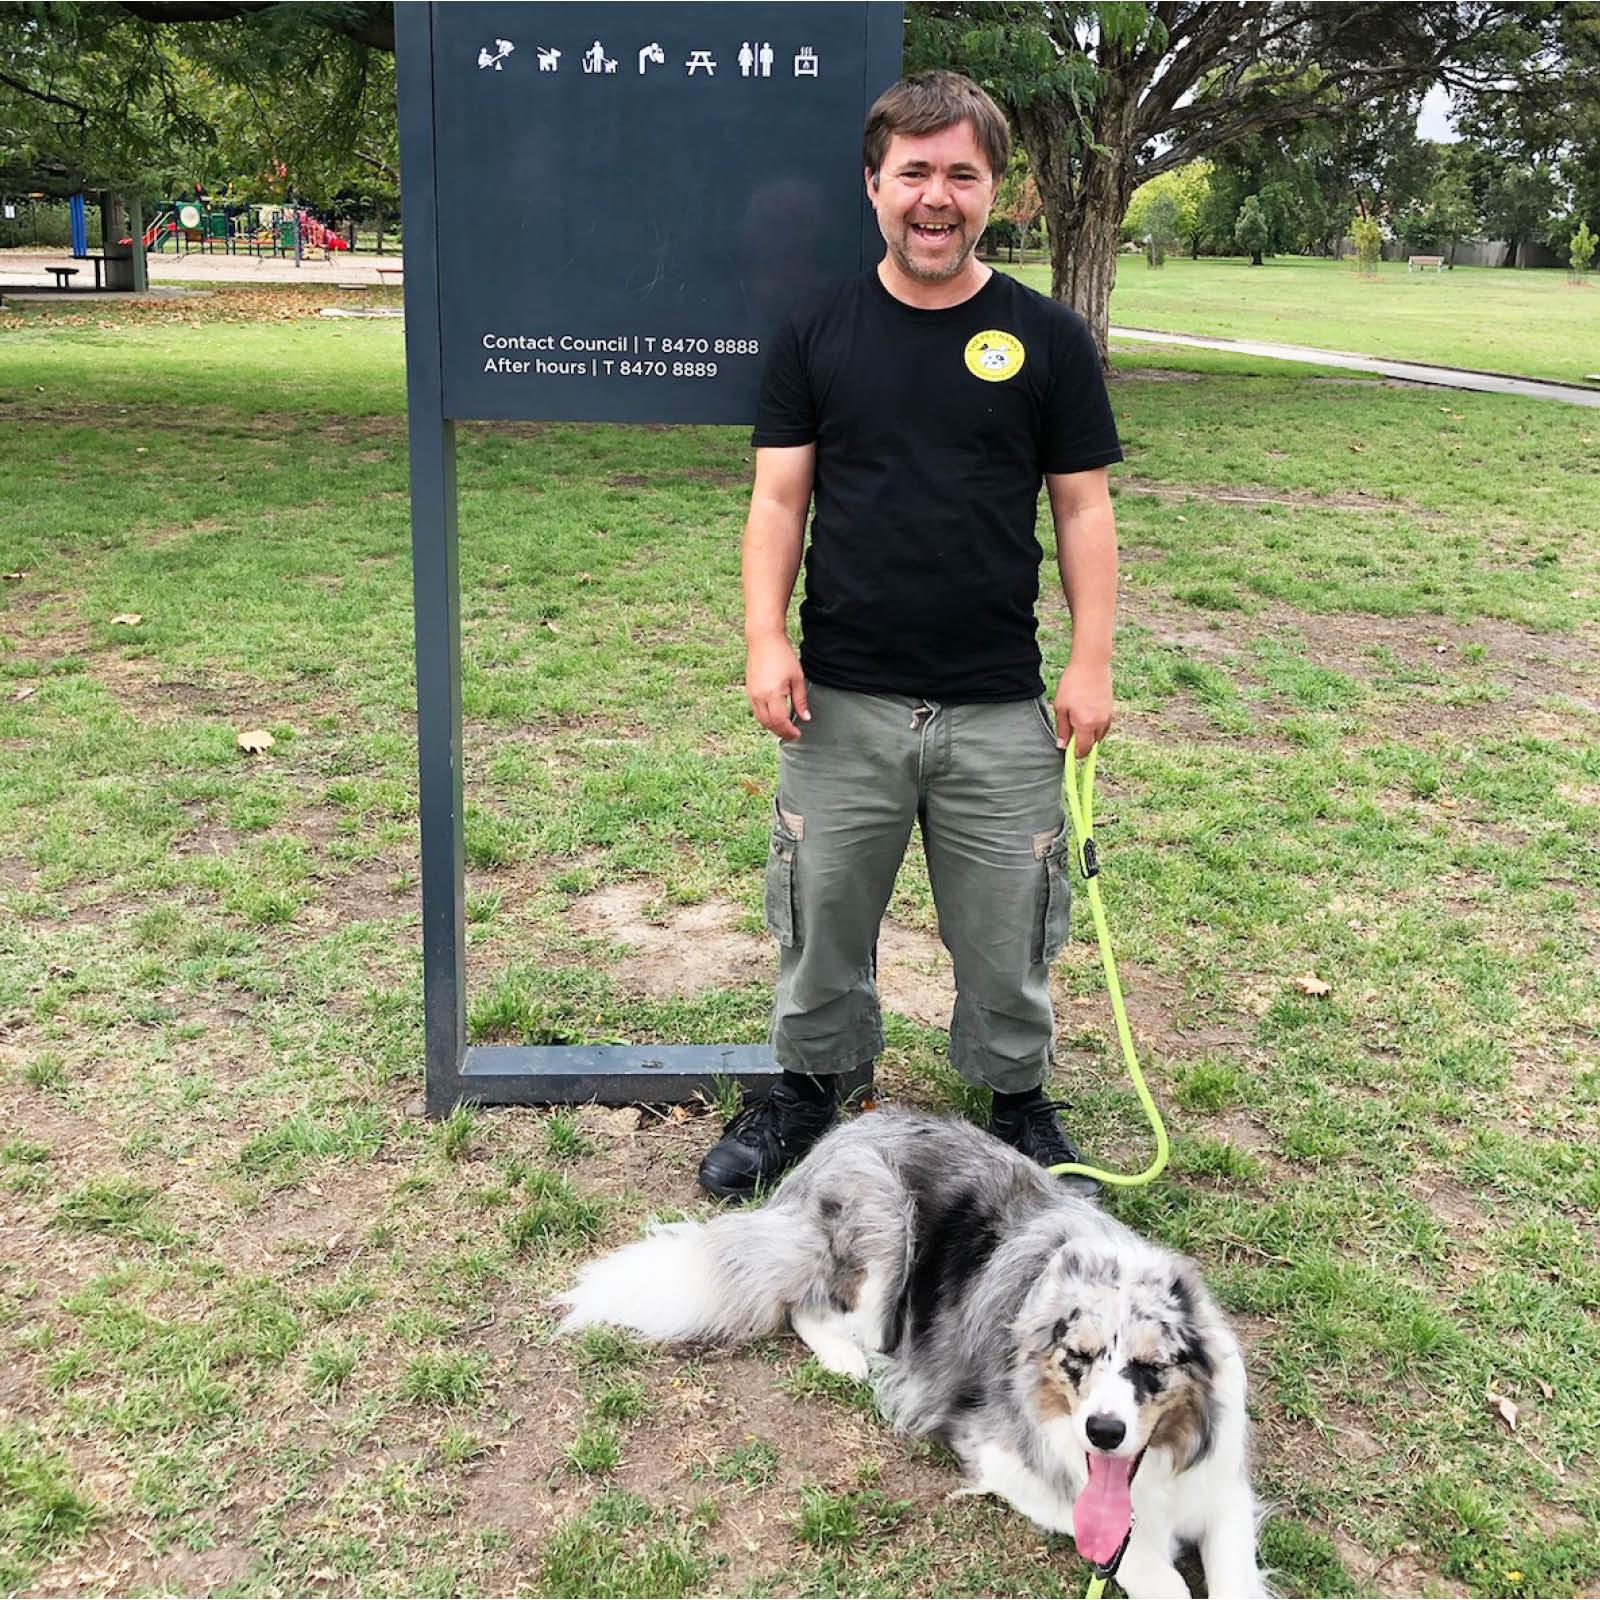 the-pet-nanny-dog-walking-service-melbourne-3